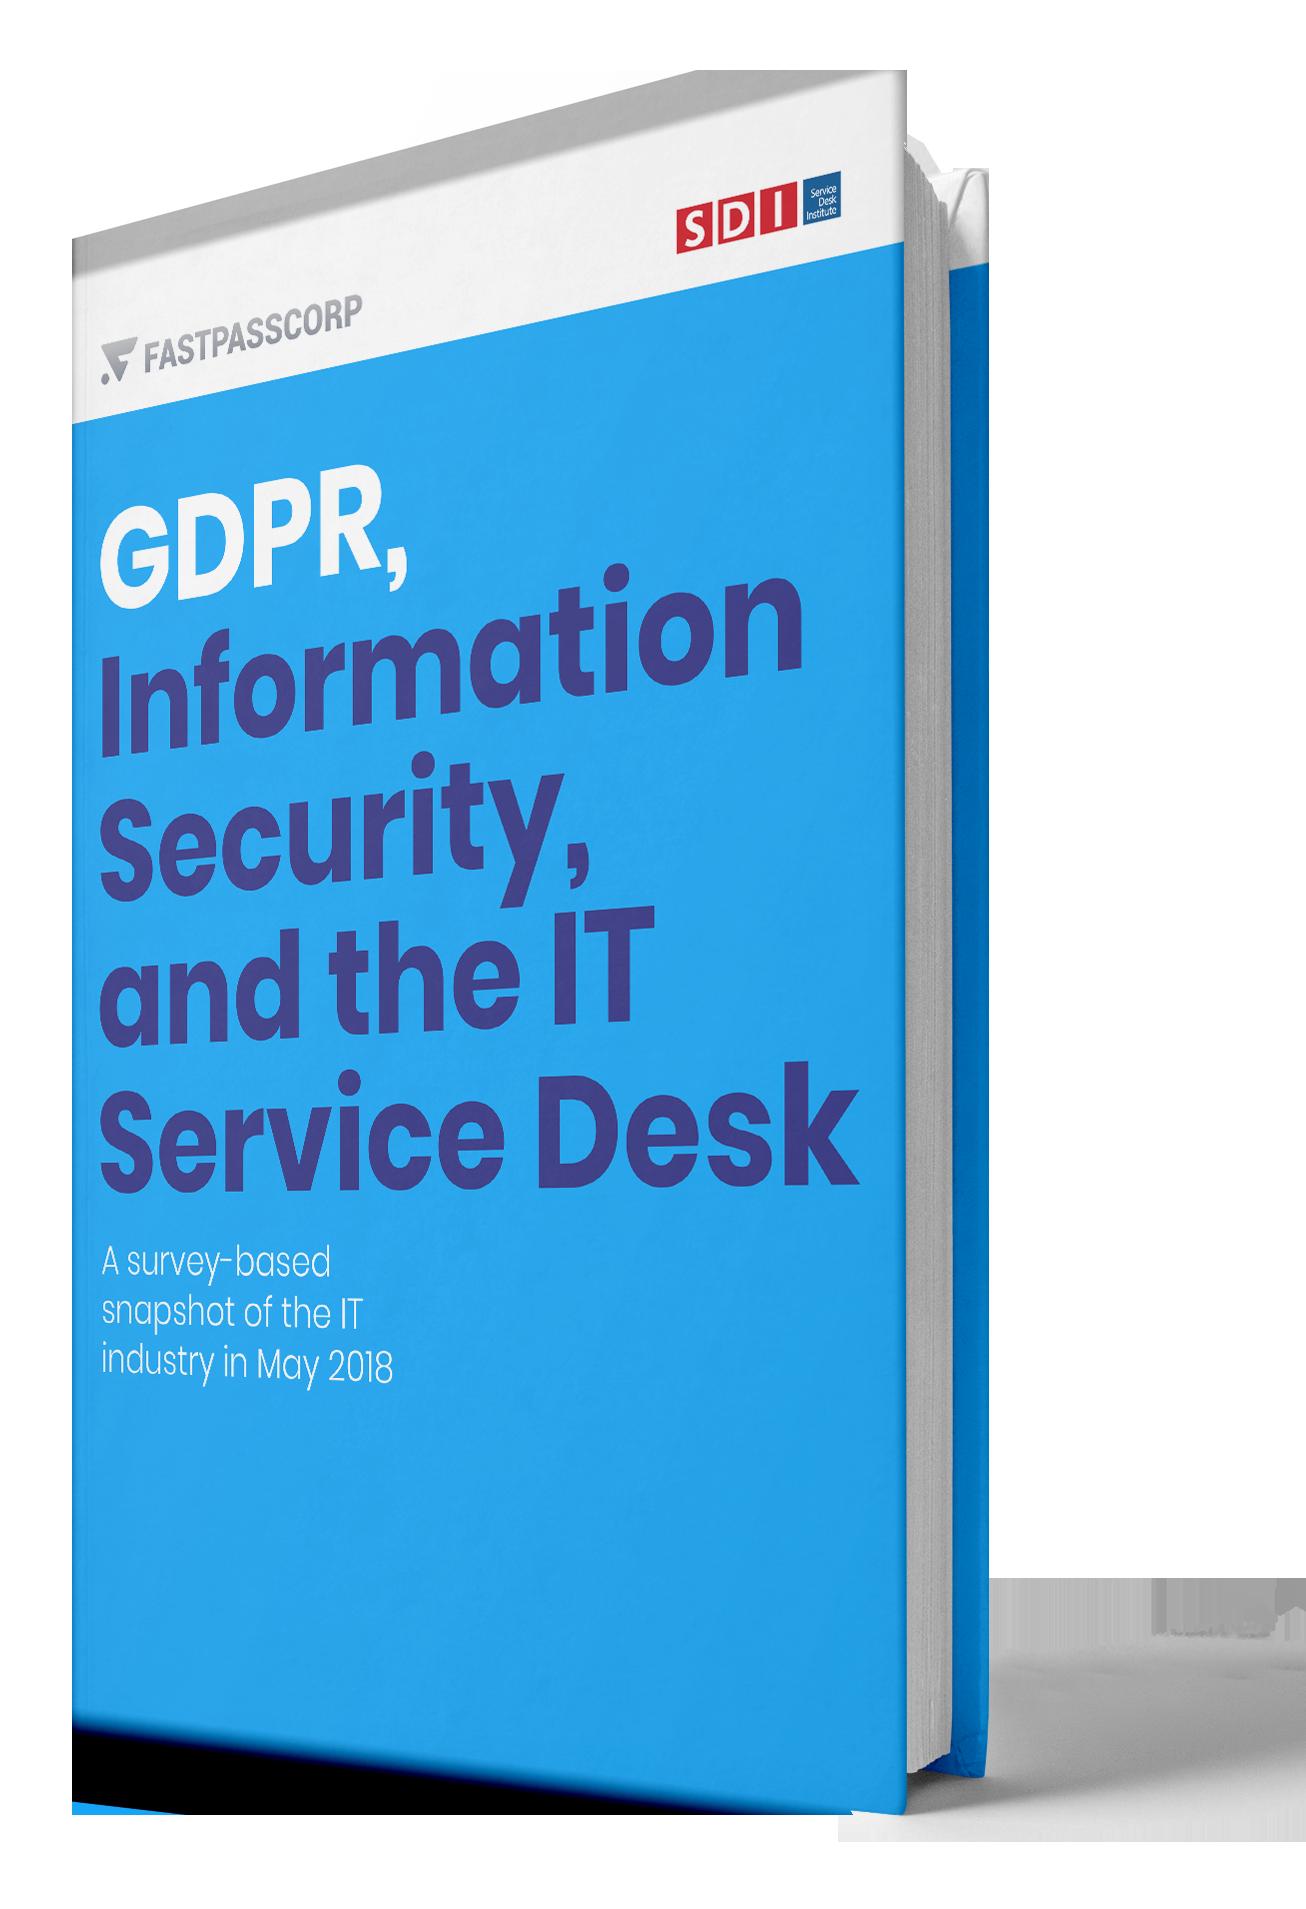 SDI-GDPR-IT-Service Desk ebook